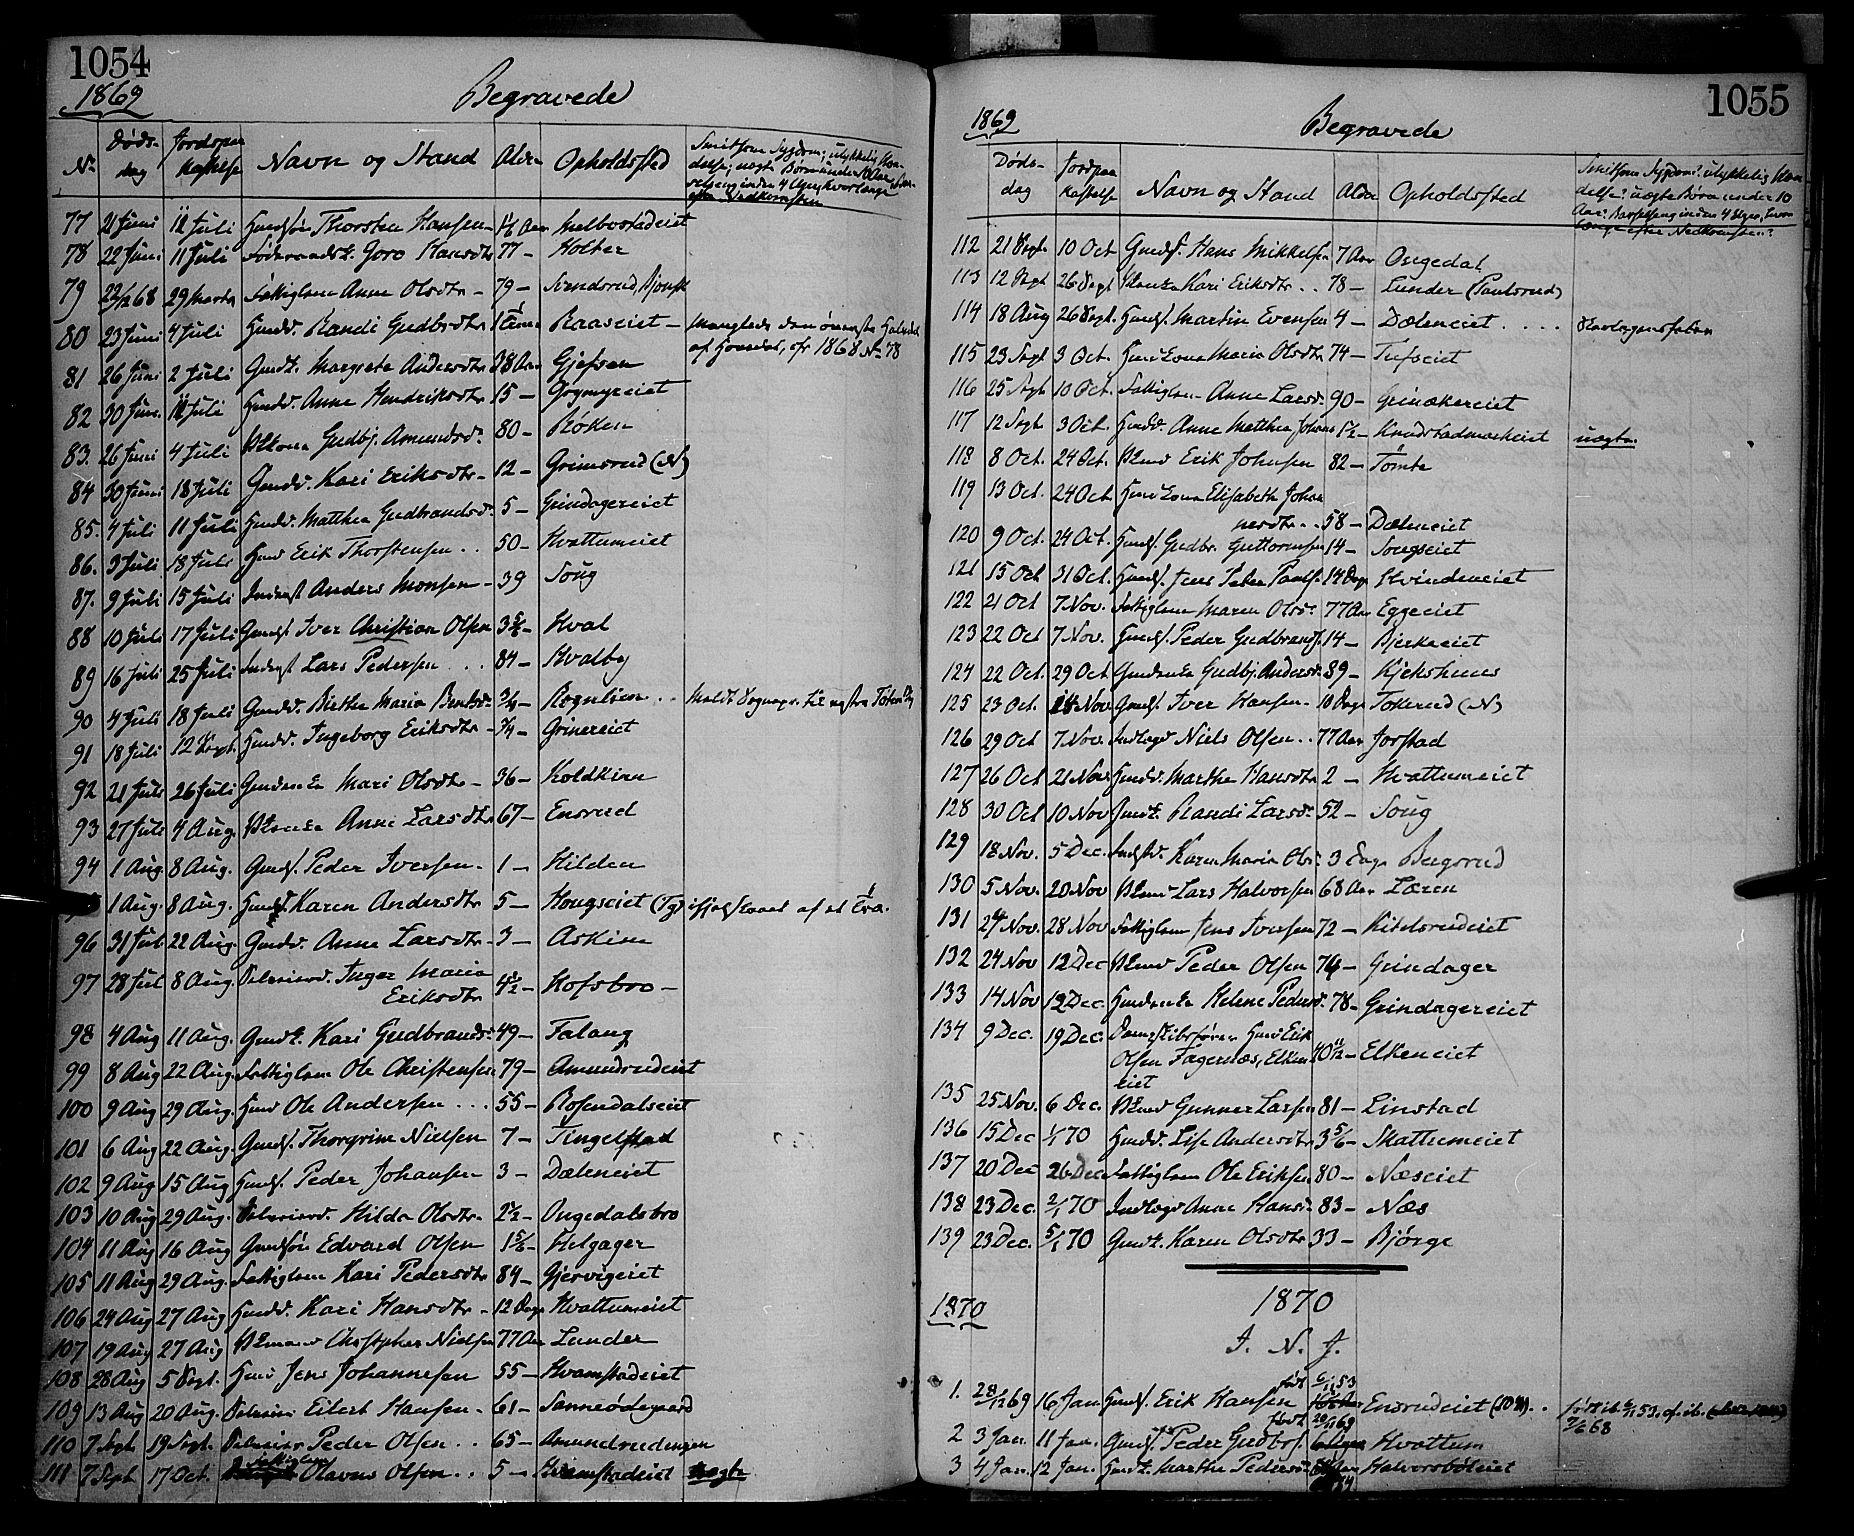 SAH, Gran prestekontor, Ministerialbok nr. 12, 1856-1874, s. 1054-1055